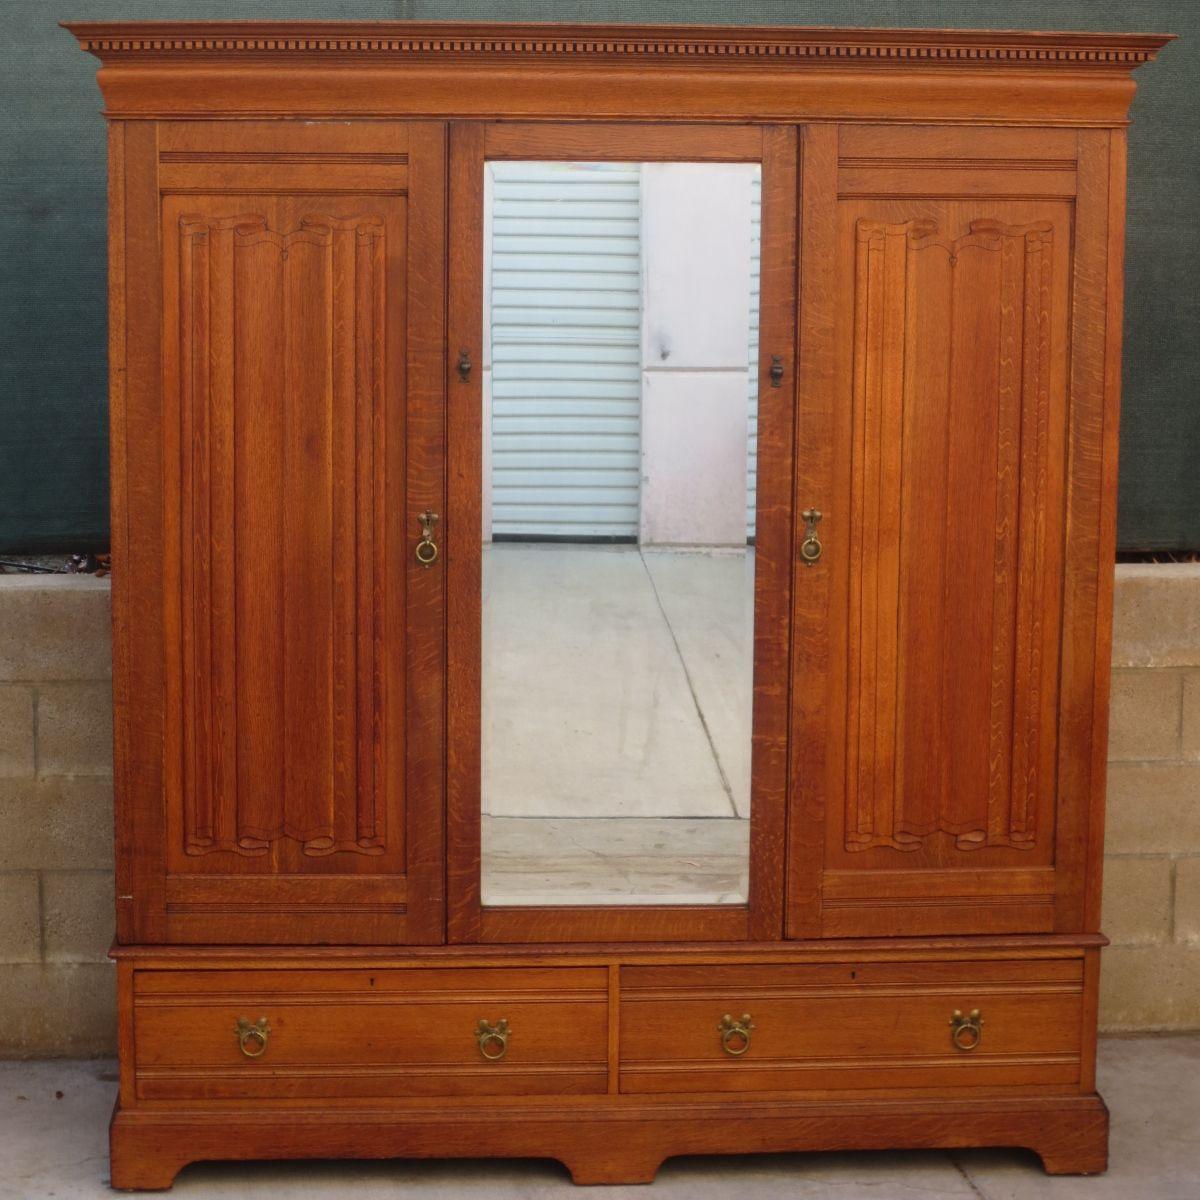 Antique Armoires and Antique Wardrobes - Antique Armoire Antique Wardrobe Antique Furniture Linen Fold